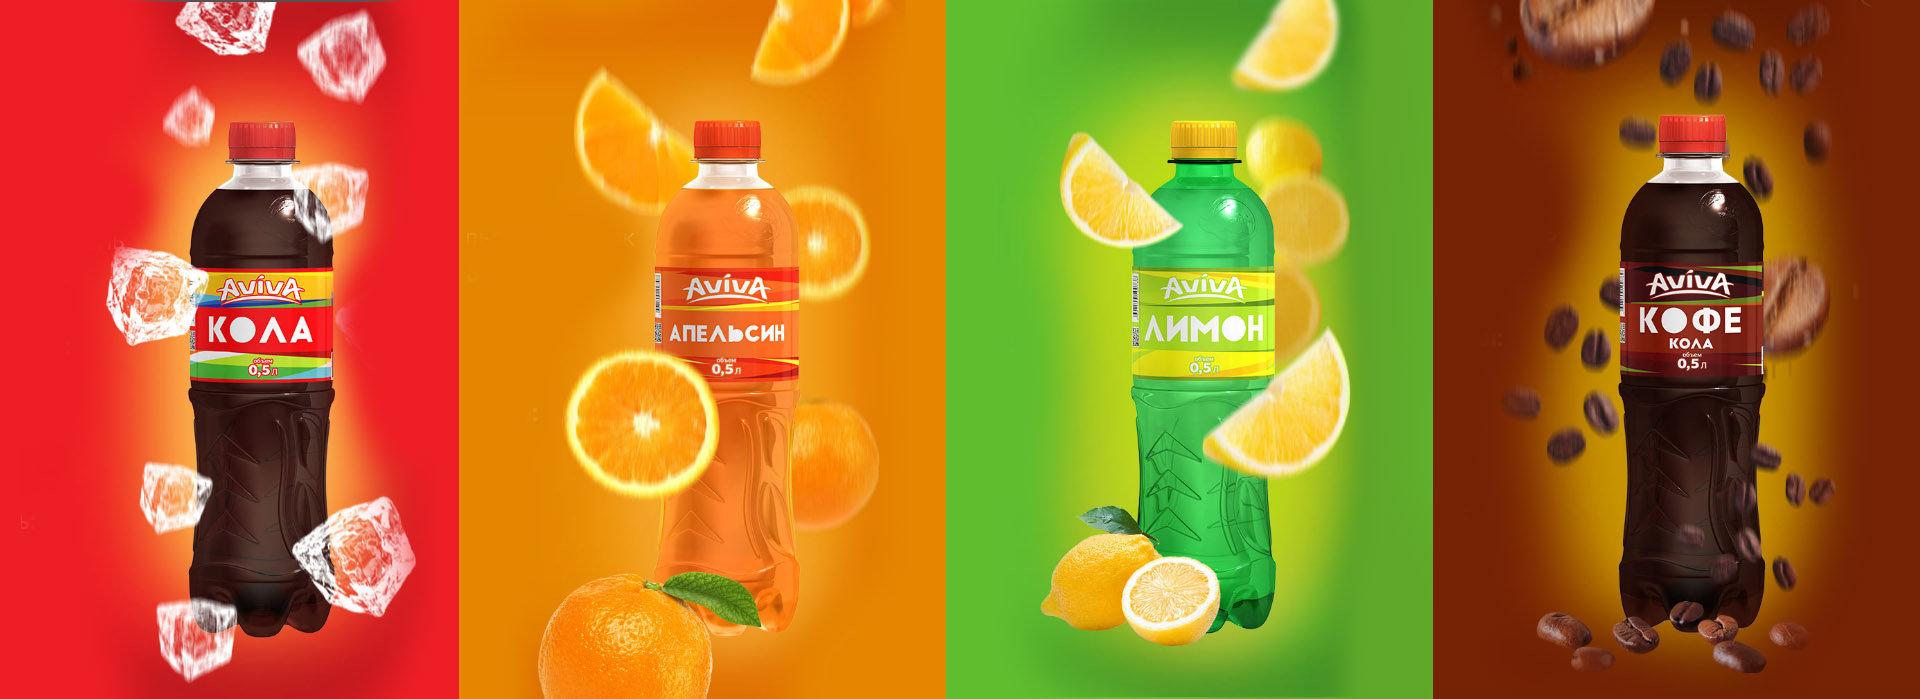 Soda label design, design этикетки лимонада